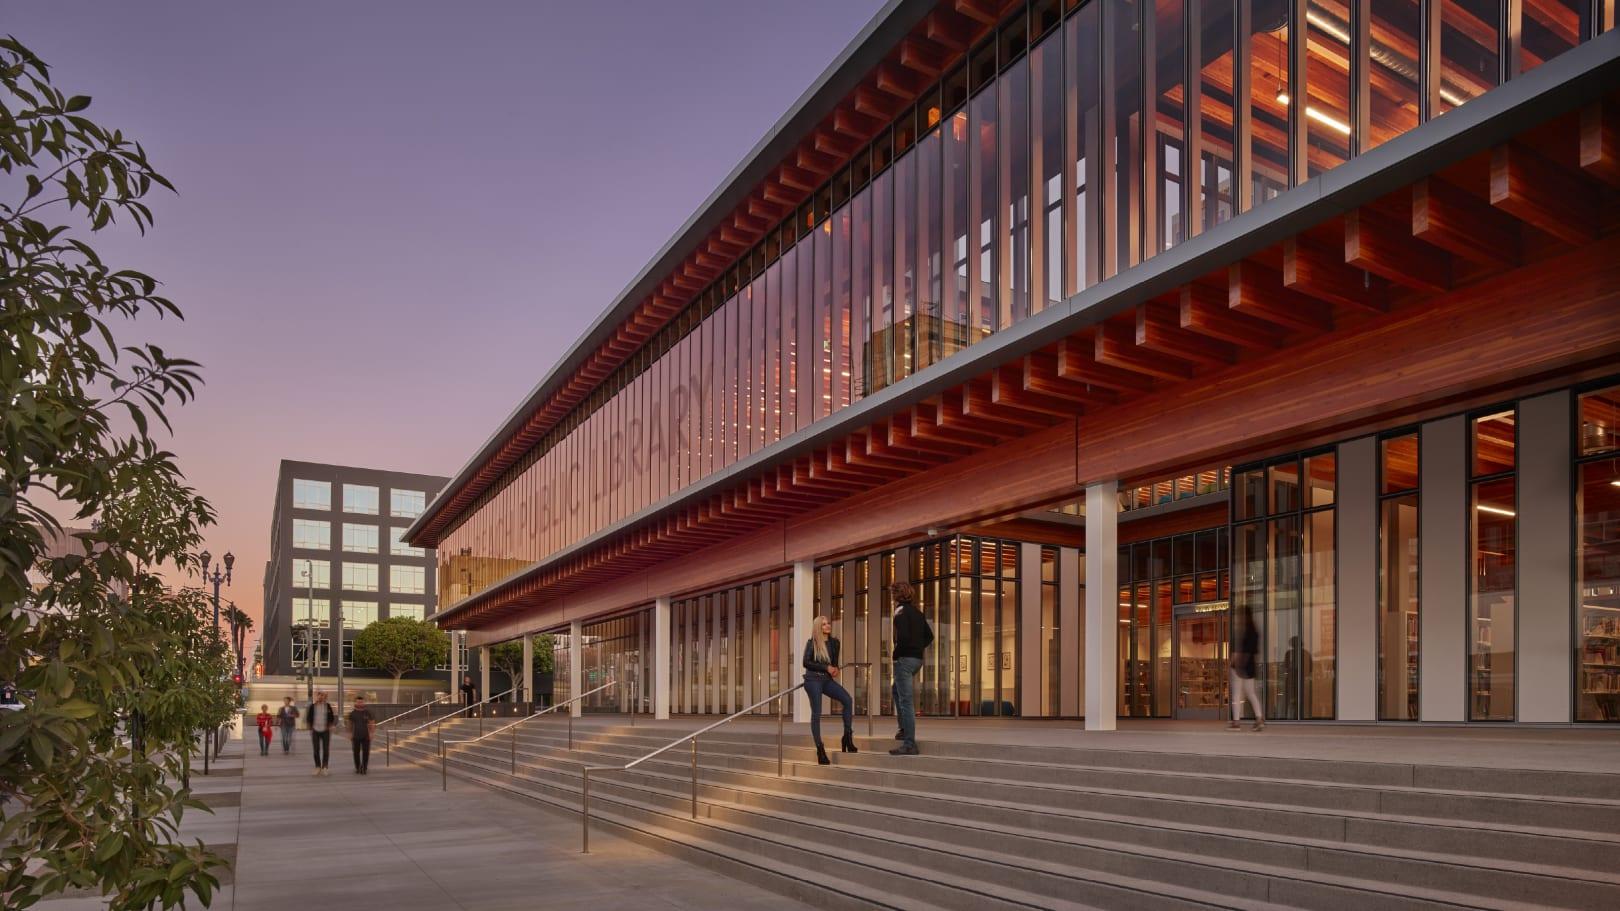 Billie Jean King Main Library-04